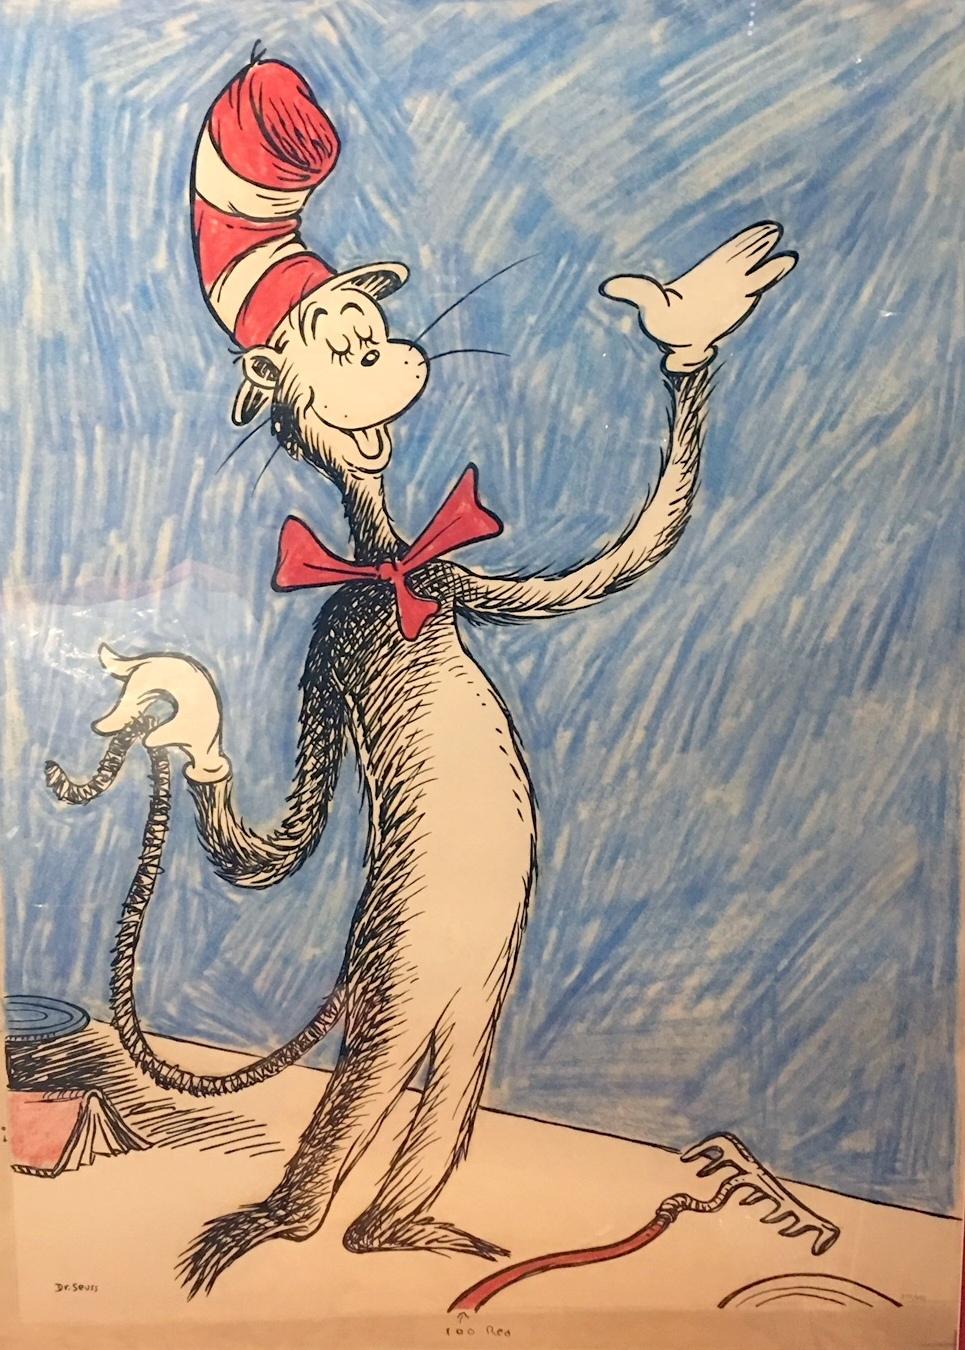 Dr. Seuss art, Oh the Places You'll Go, illustrative art, secret art, unorthodox taxidermy, archive works, Dr Seuss Bronze